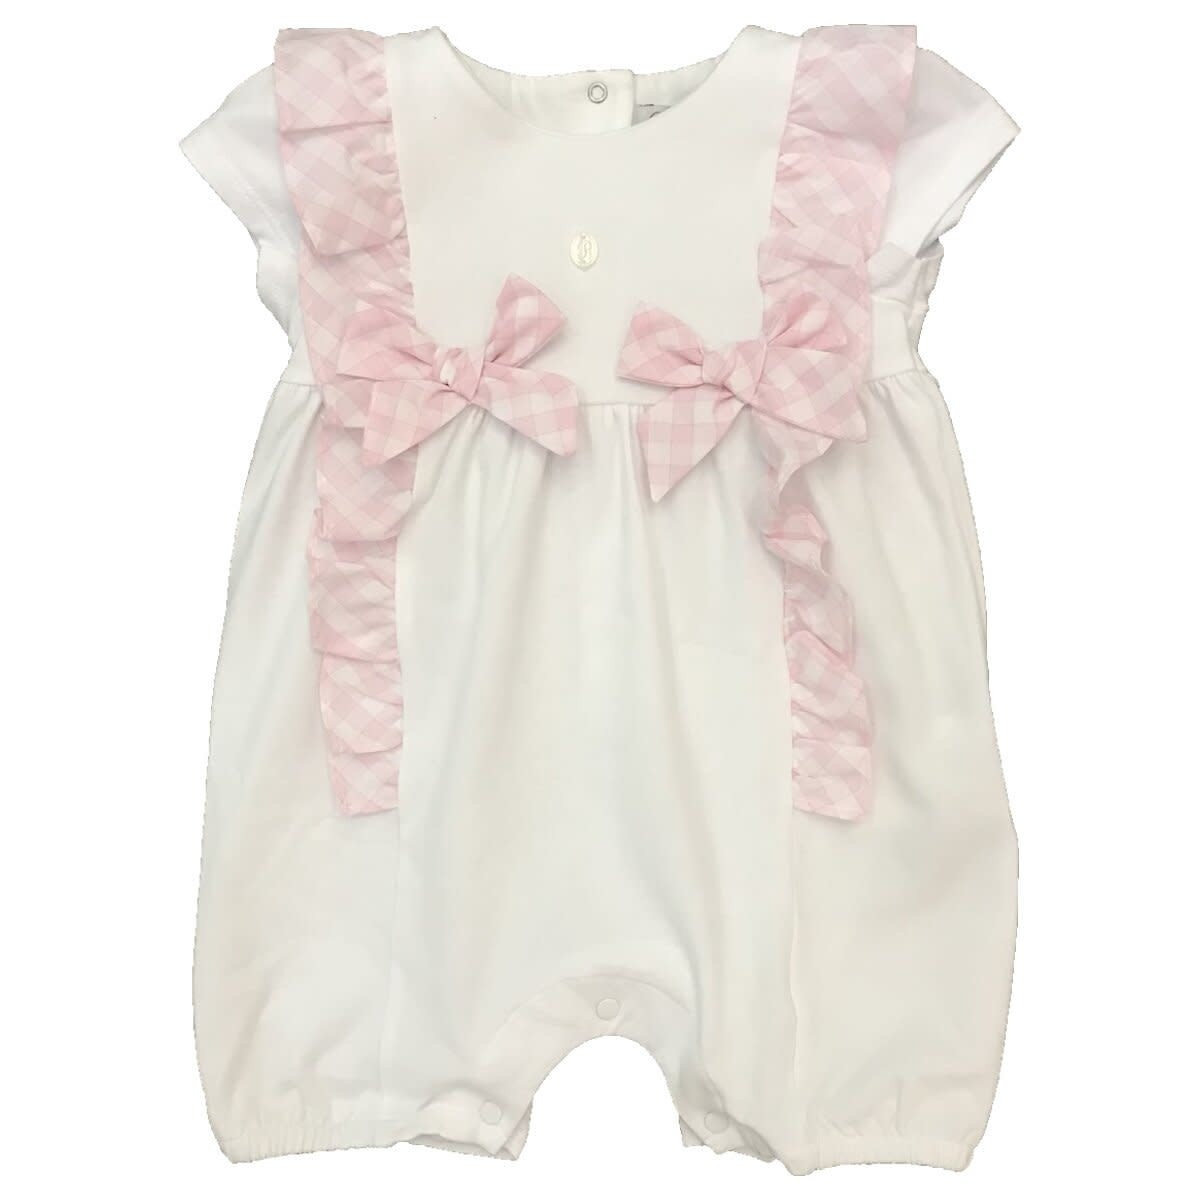 Patachou Patachou Baby Bow Romper 3078 S21